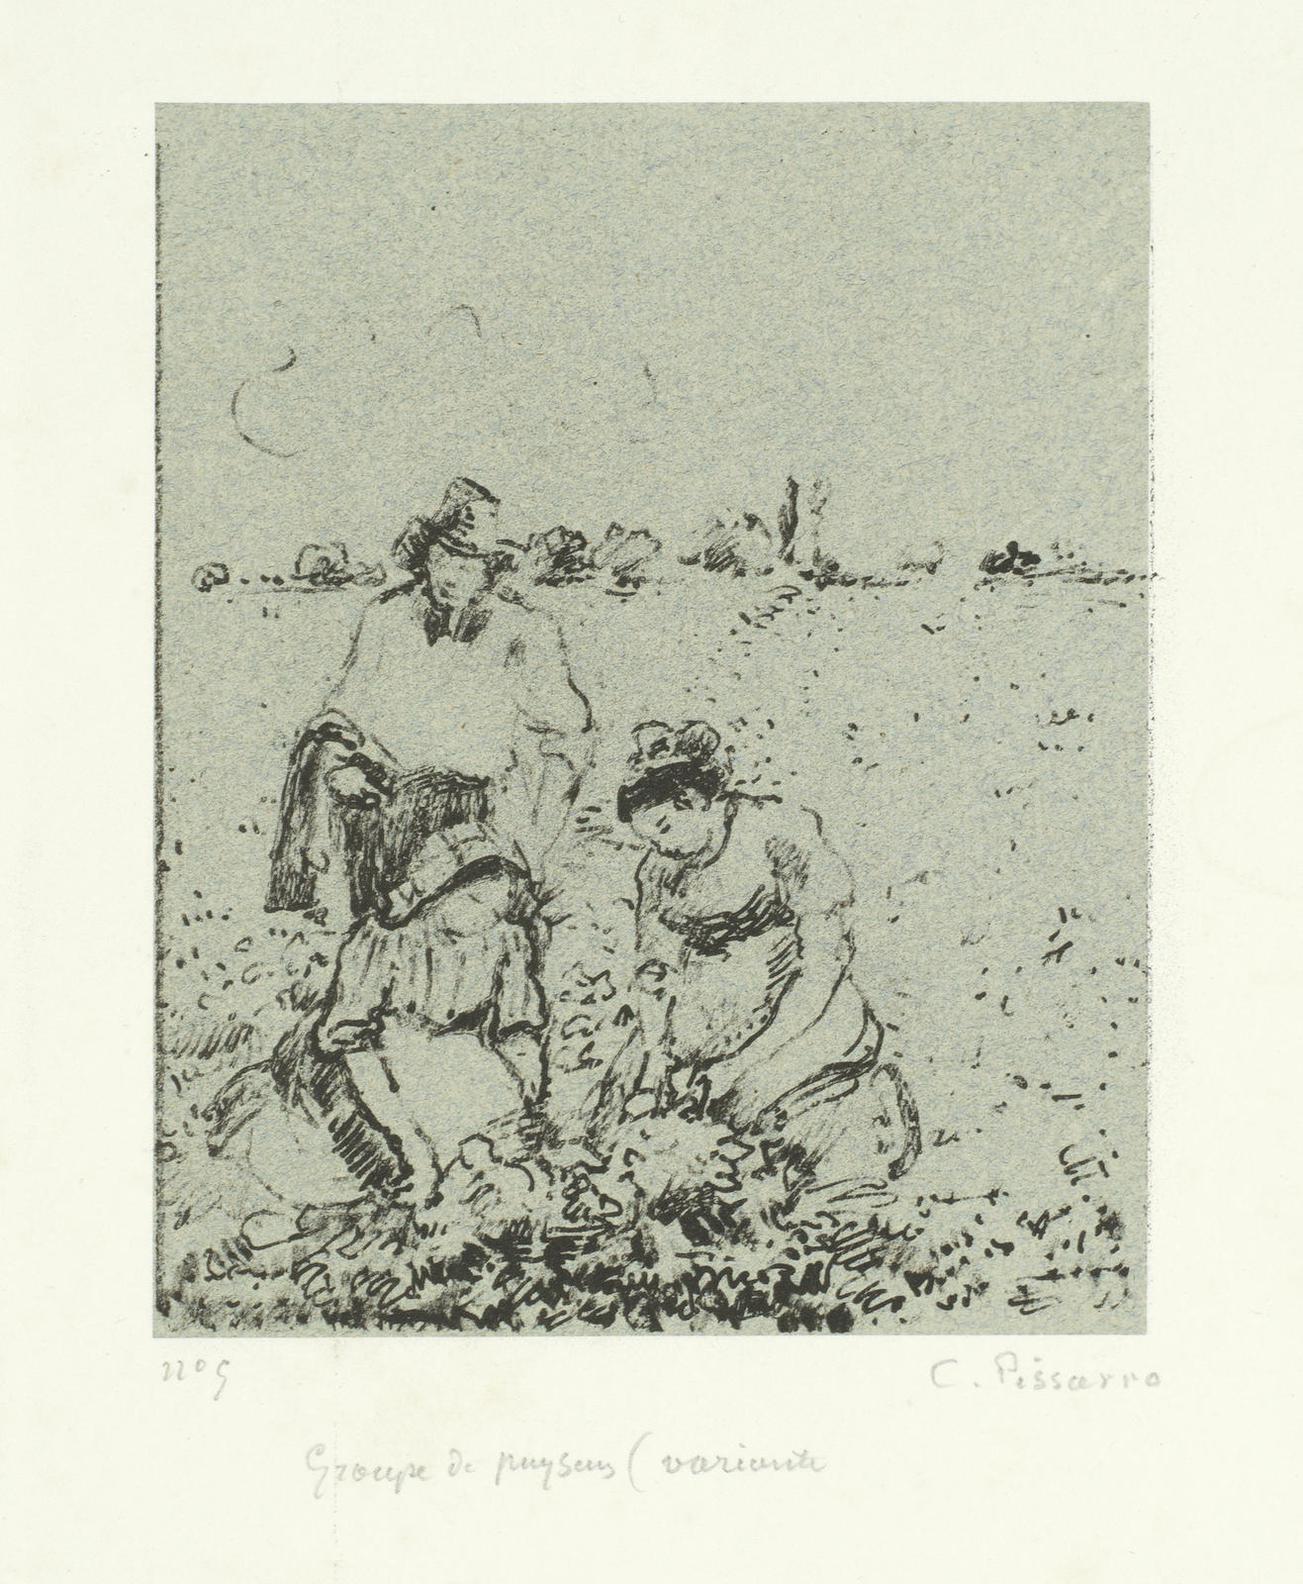 Camille Pissarro-Rue Gericault, A Rouen (D. 173)-1896